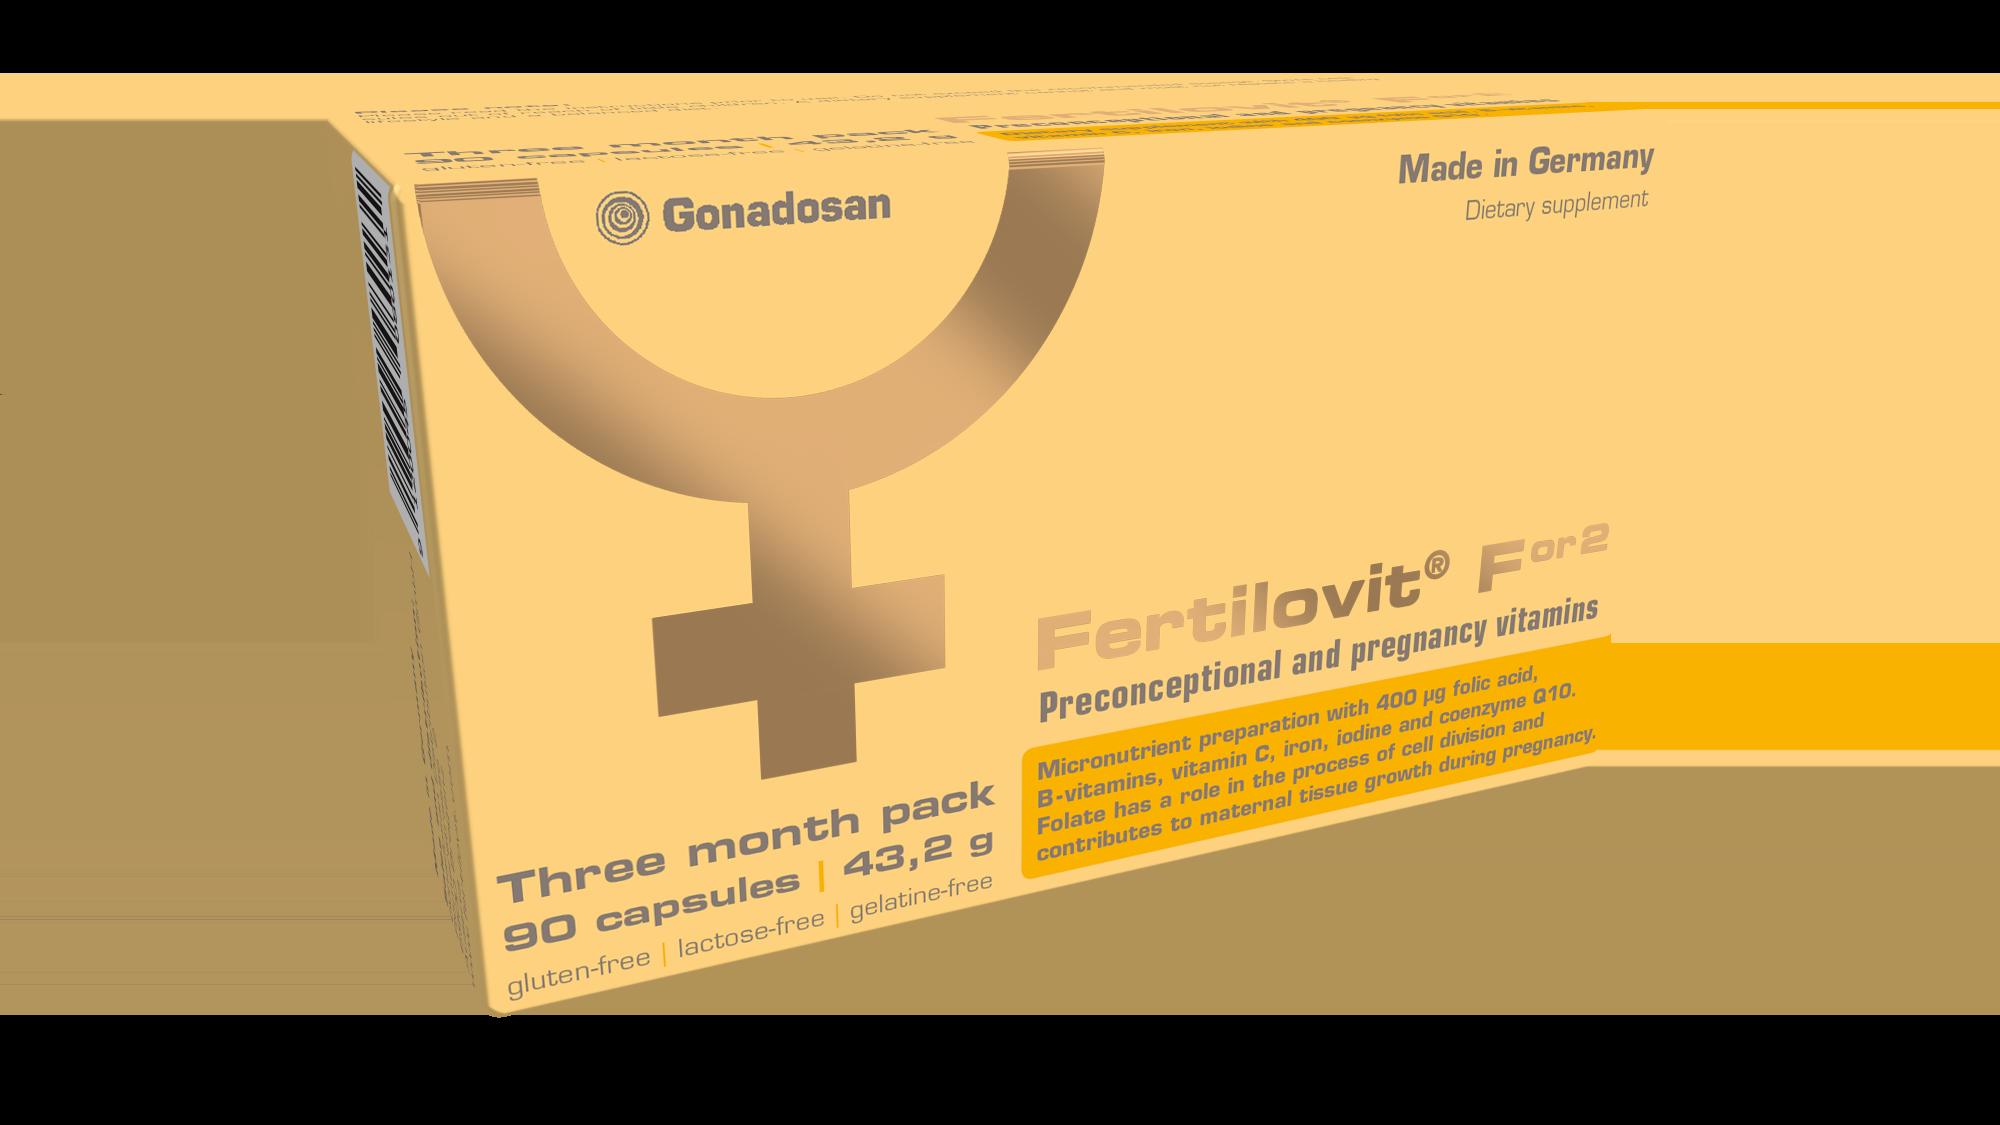 Fertilovit F or 2 Προηγμένο Συμπλήρωμα Διατροφής για την ασφαλή υποστήριξη των απαιτήσεων των γυναικών πριν τη σύλληψη, κατά τη διάρκεια της εγκυμοσύνης & του θηλασμού, 30 caps